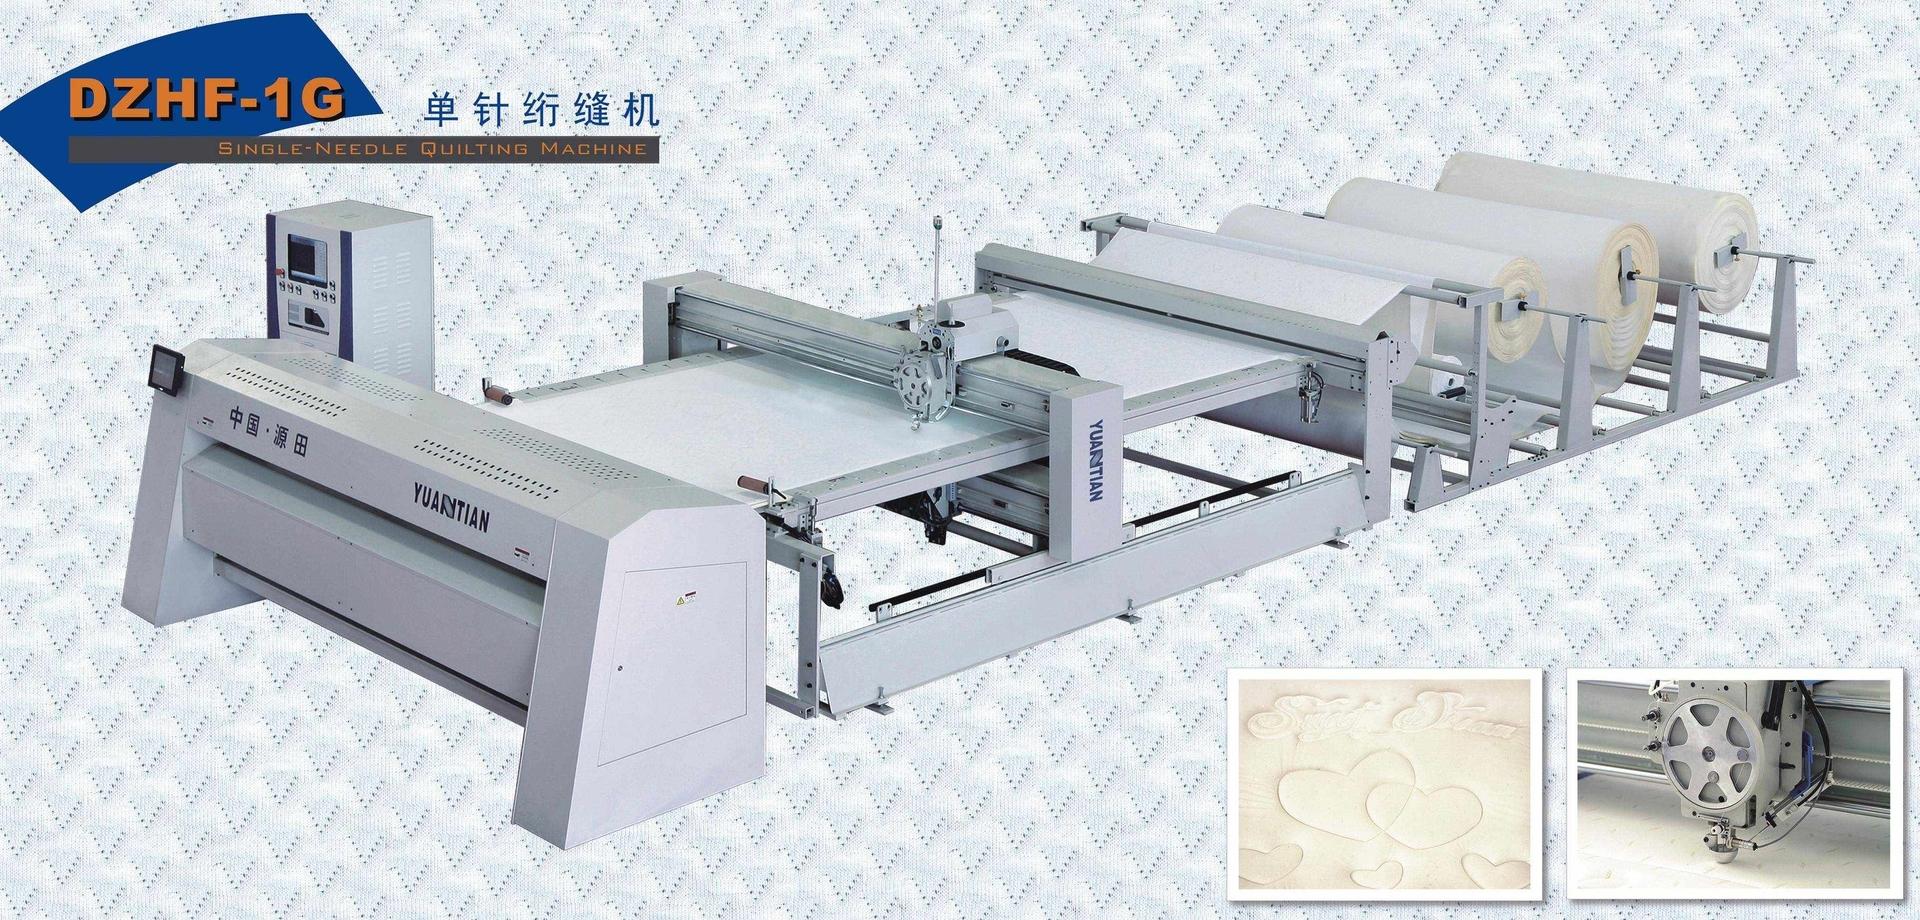 DZHF-1G单针绗缝机